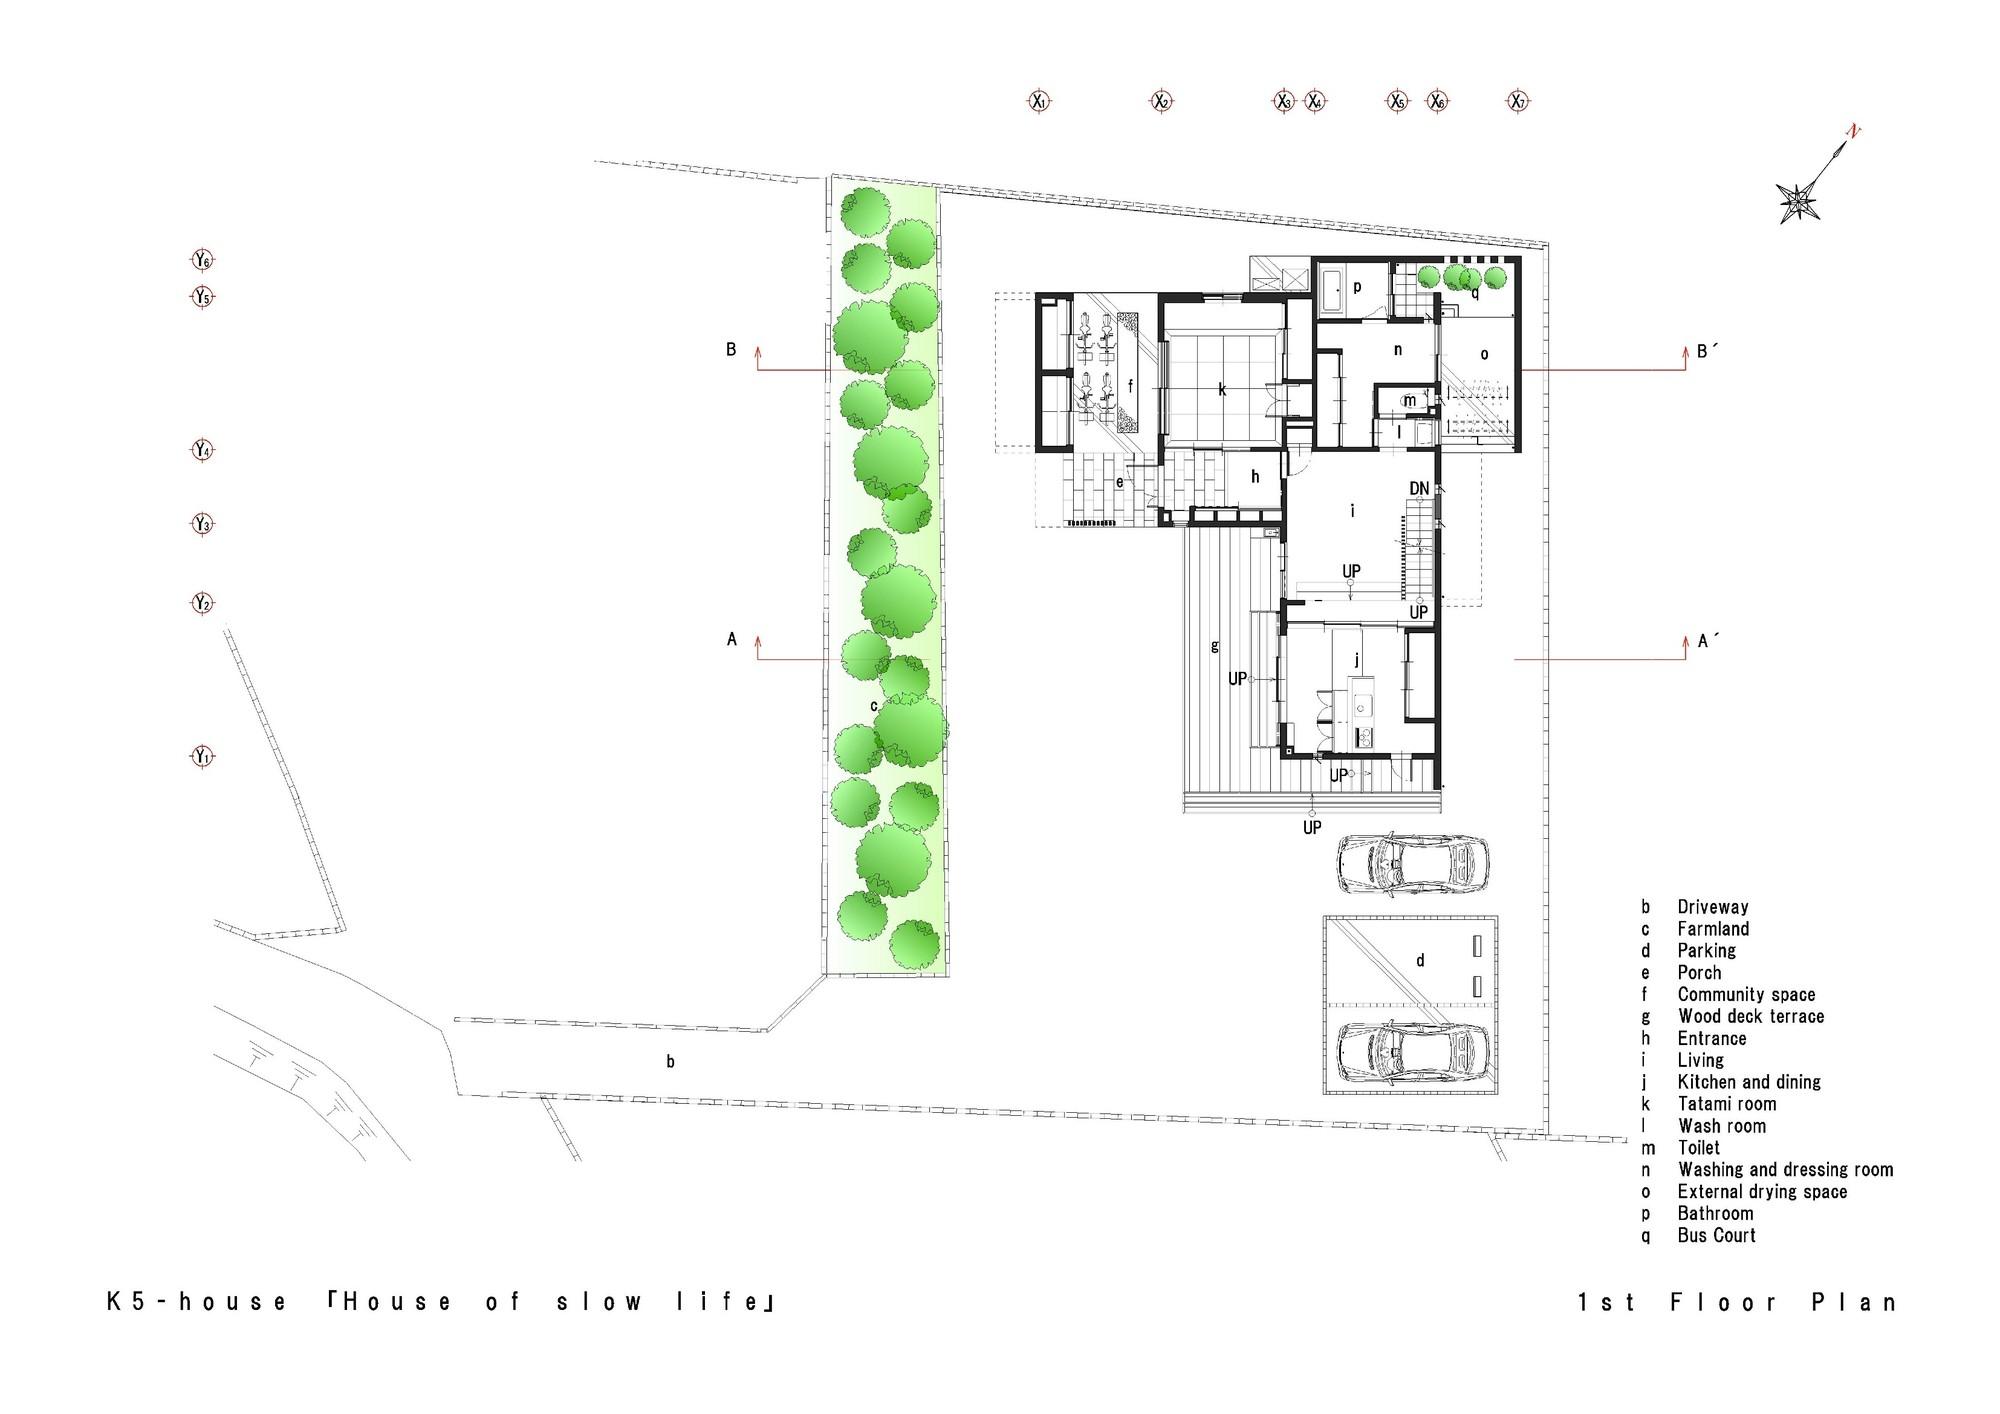 K5 House,First Floor Plan